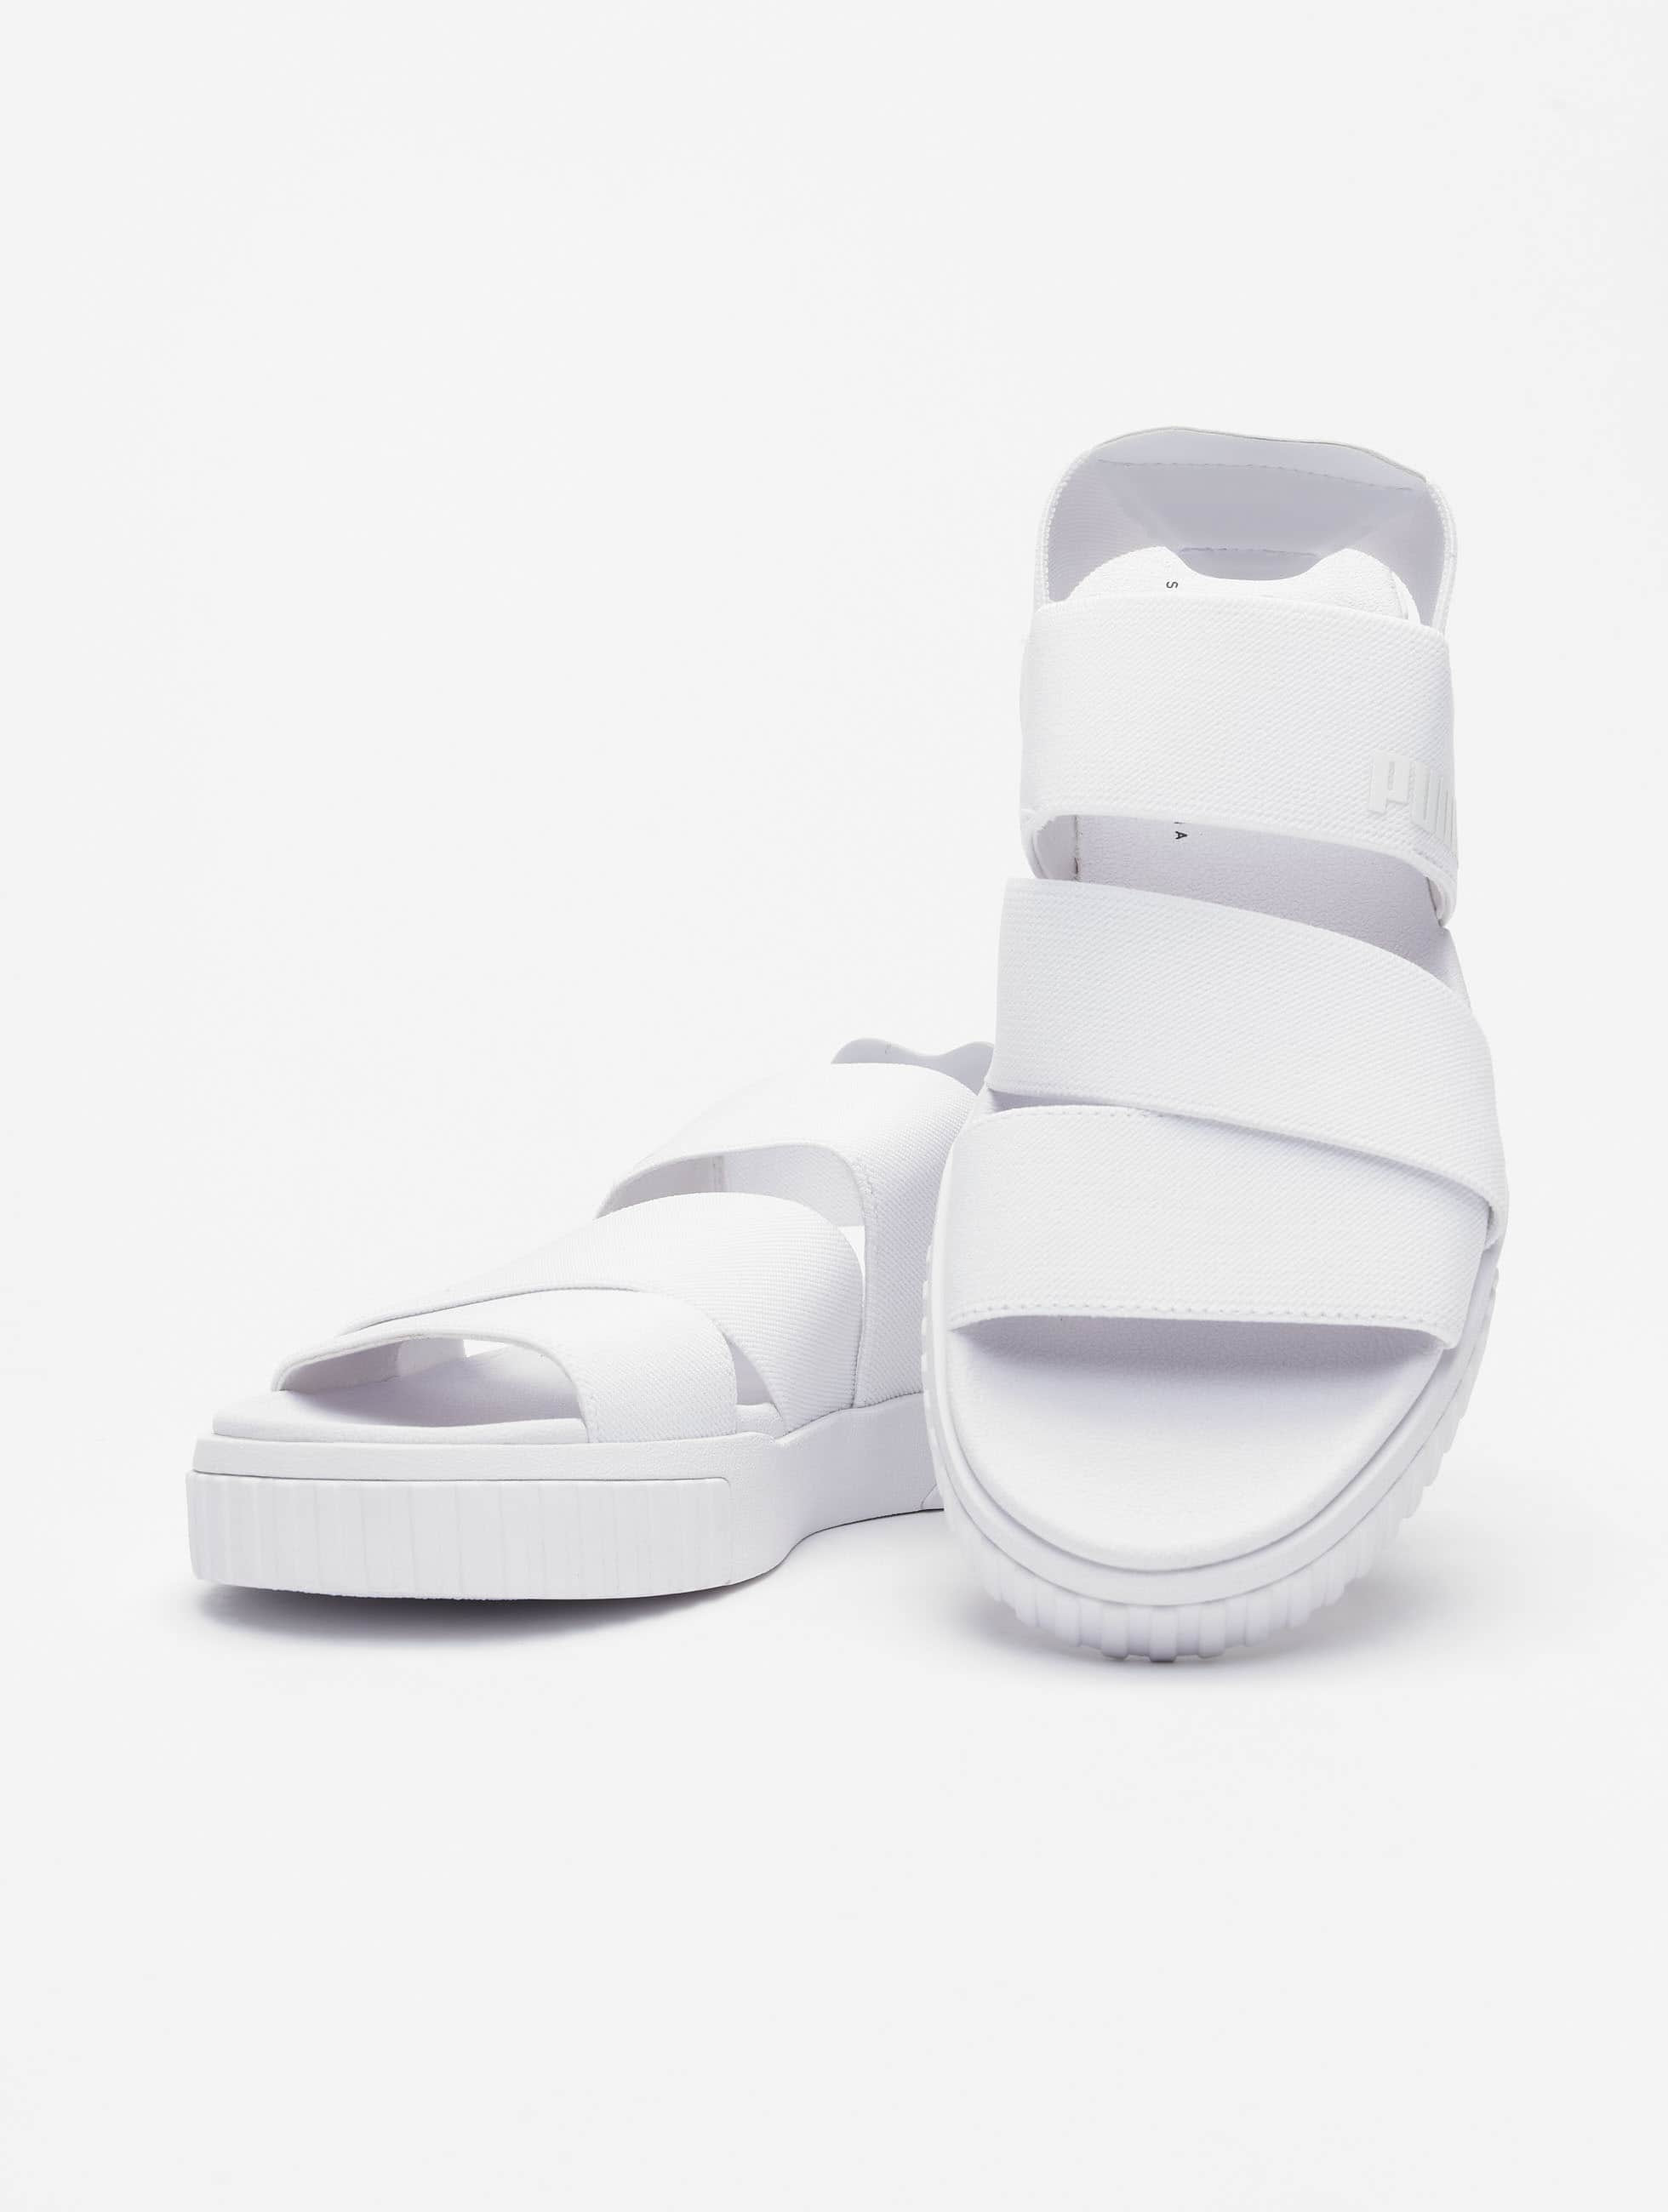 Puma Cali Sandal X SG Sneakers Puma White